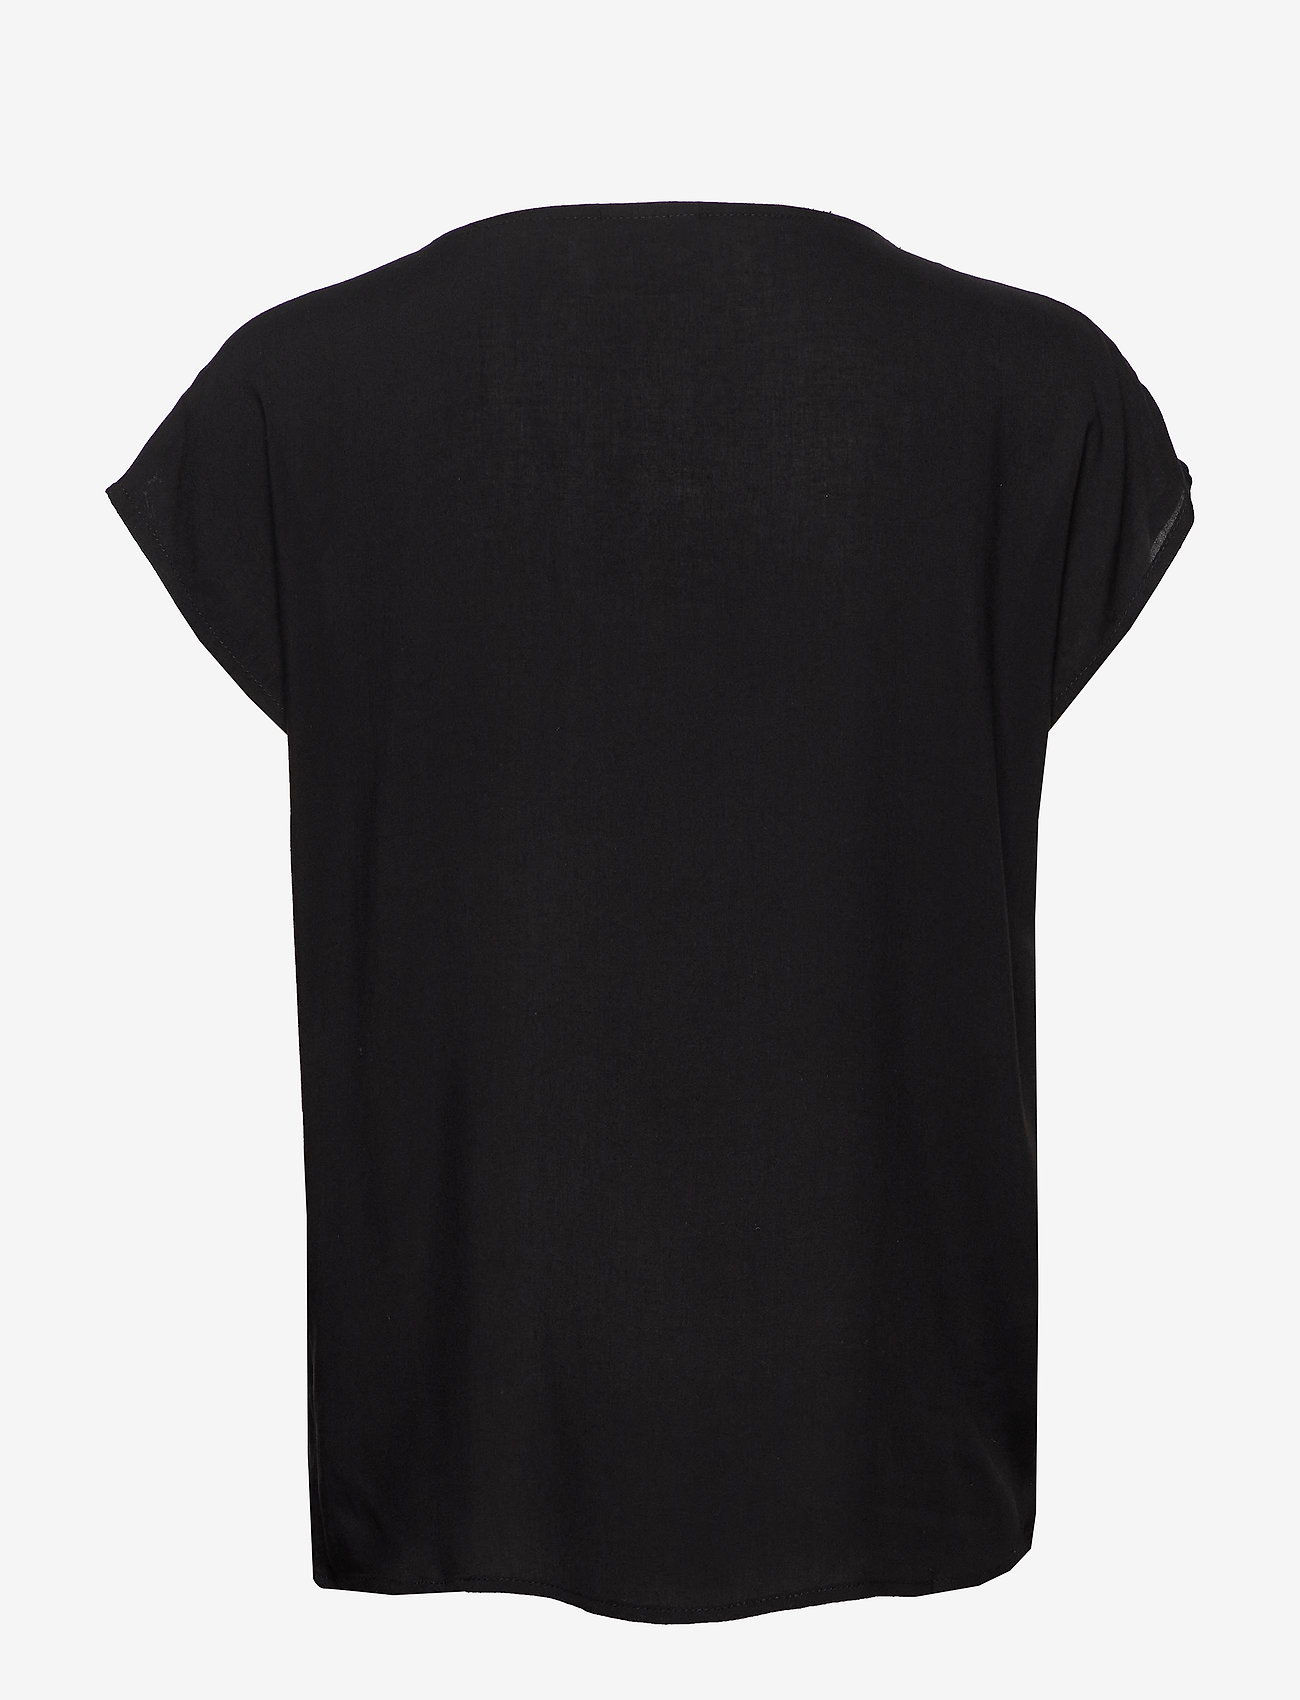 ICHI - IHMAJA SS - t-shirts - black - 1